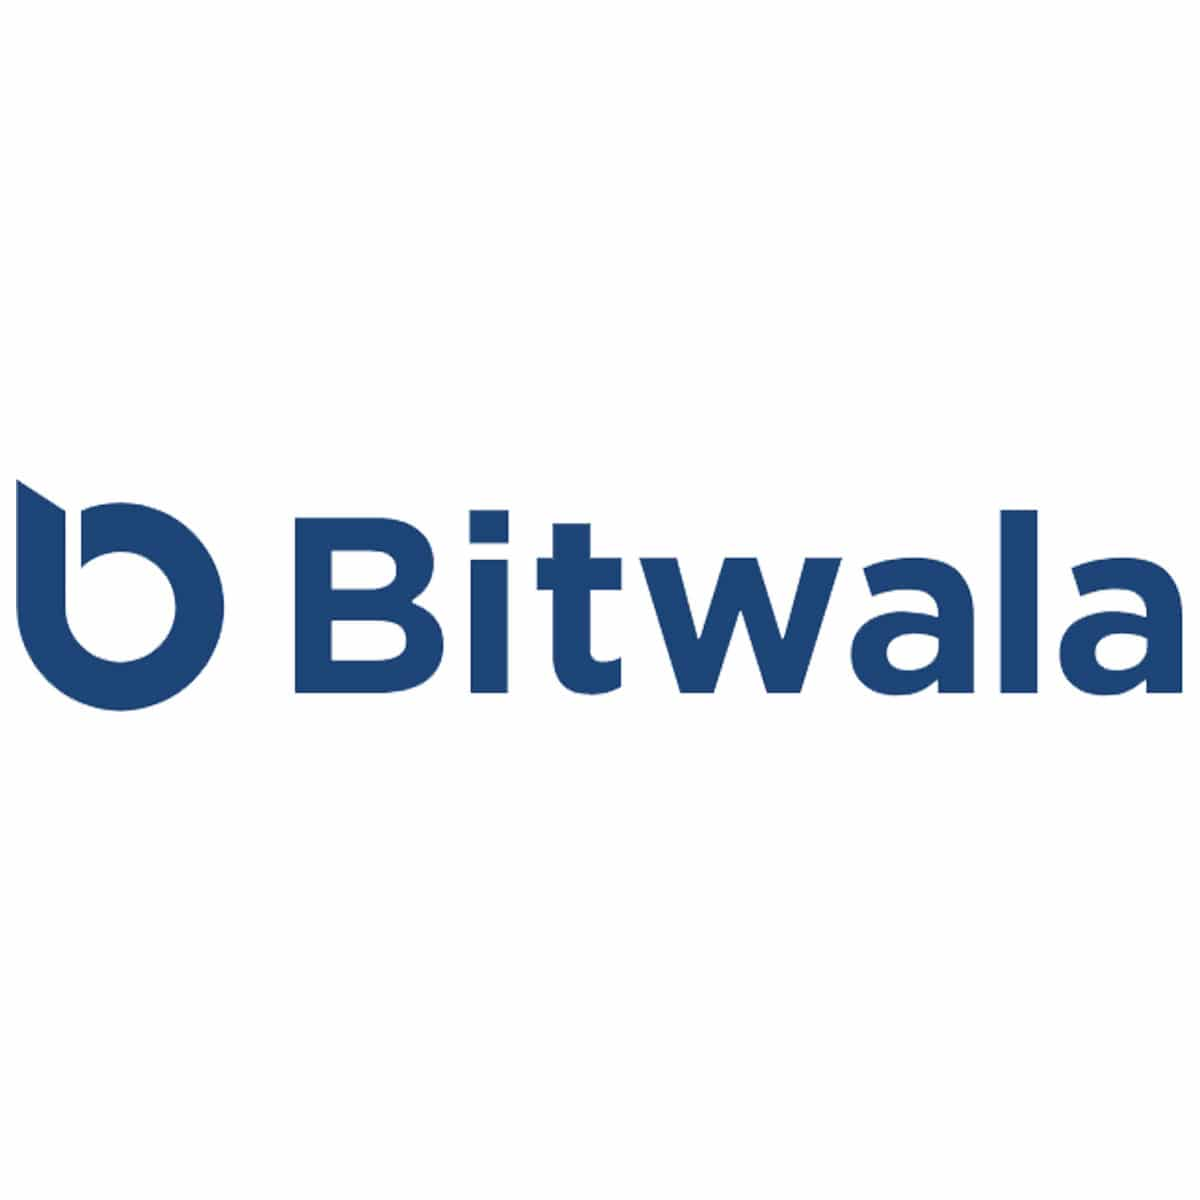 Bitwala Bank